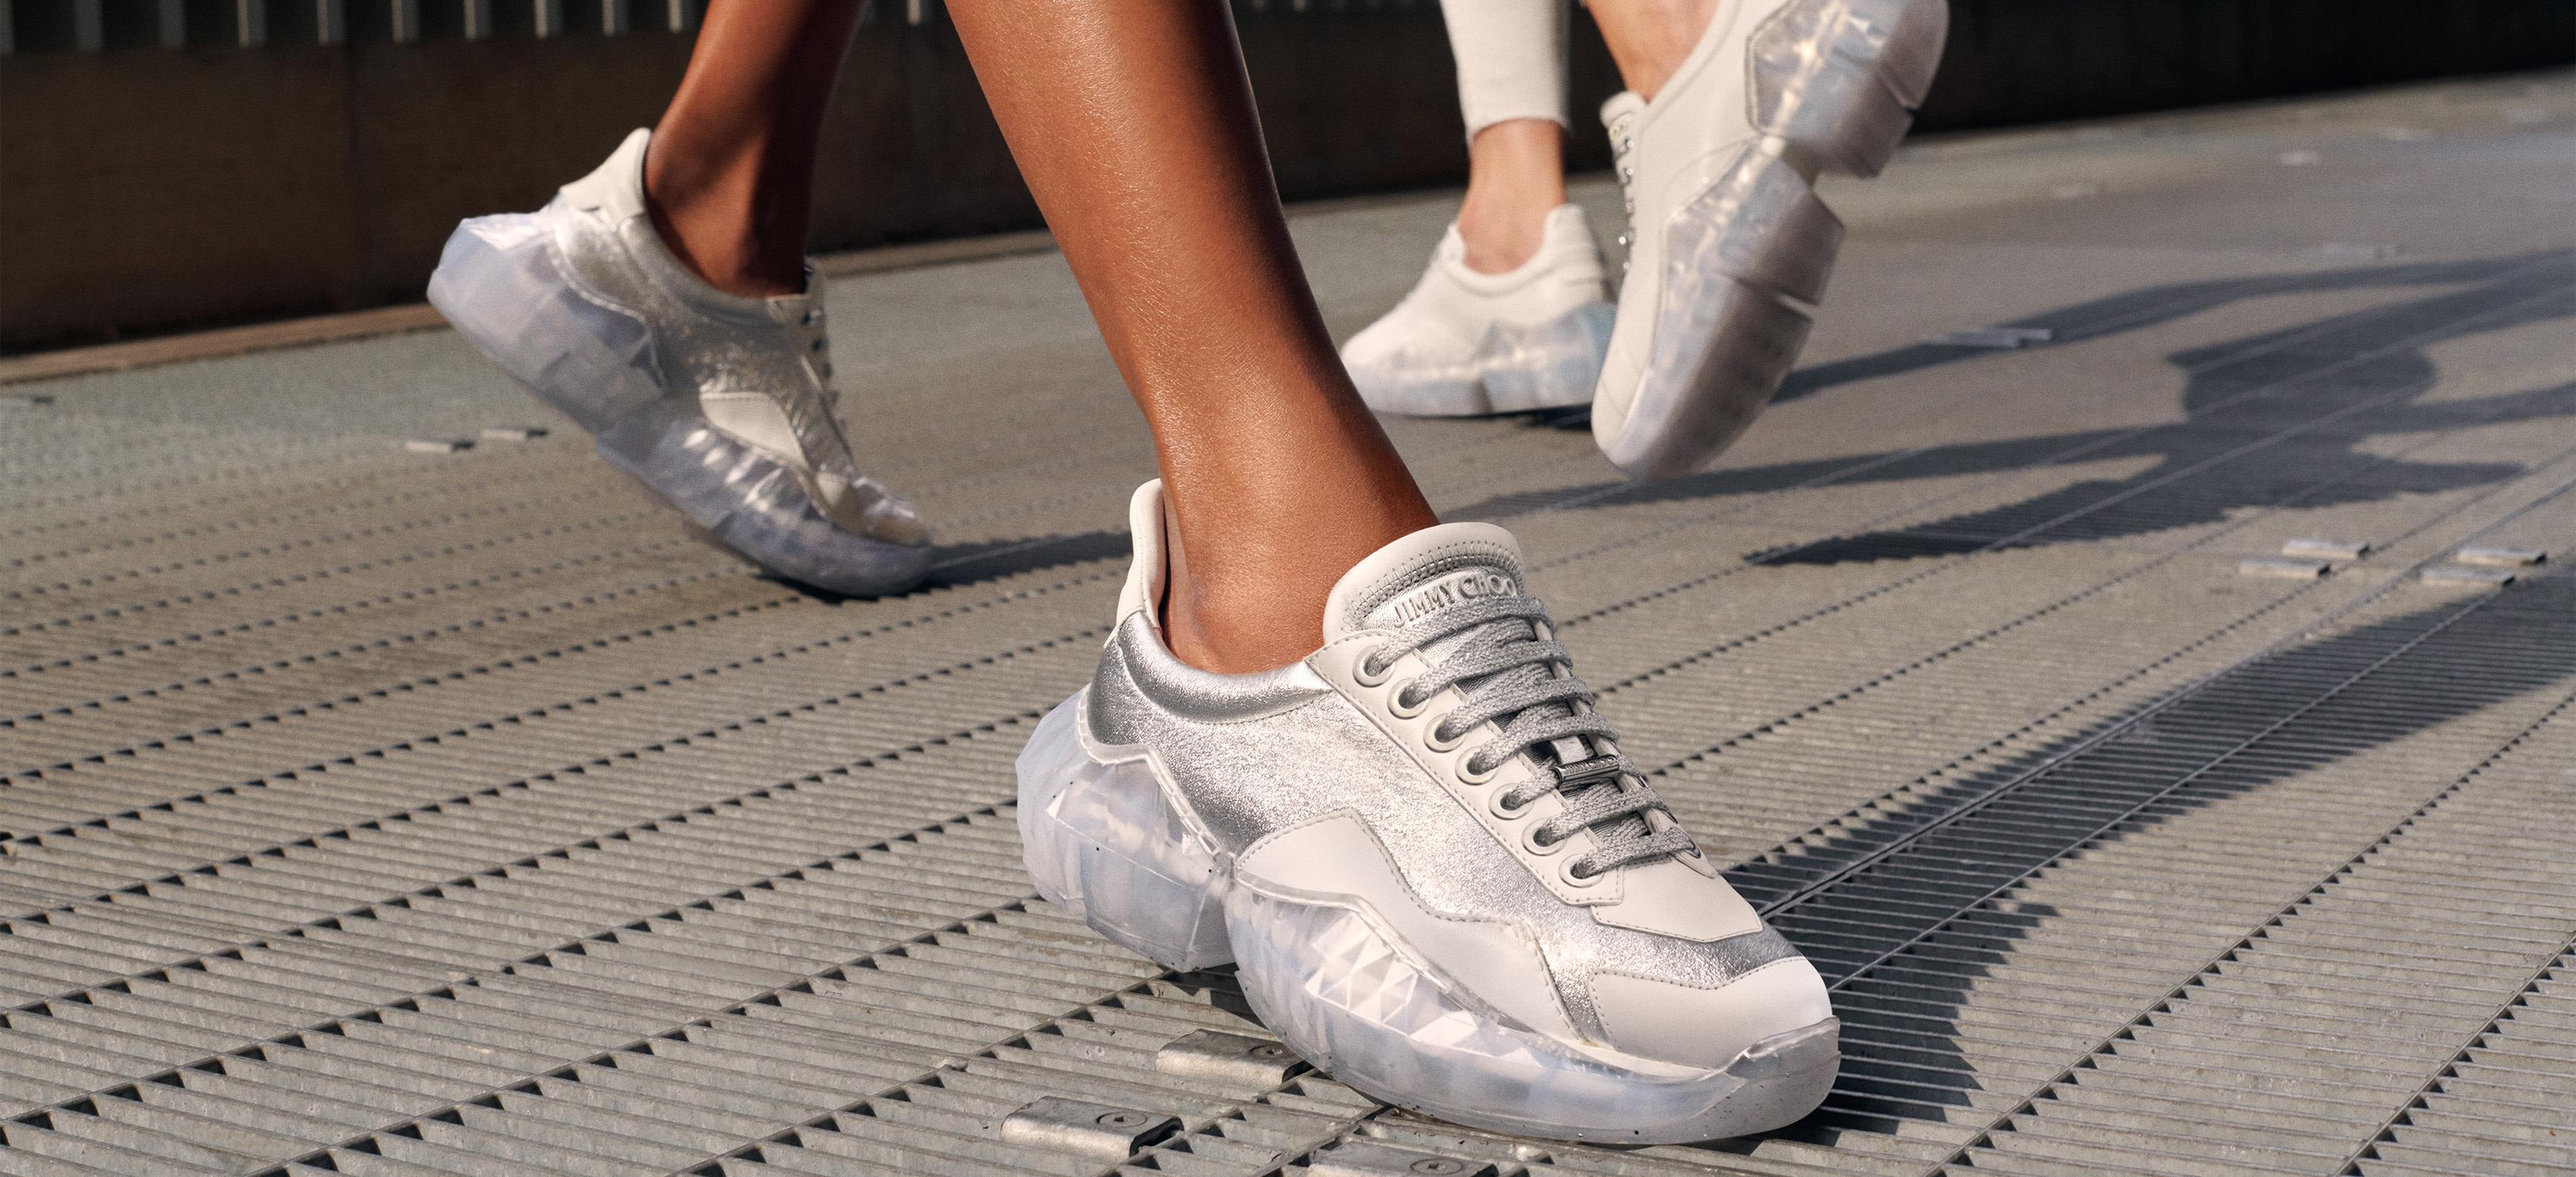 Introducing The DIAMOND Sneaker